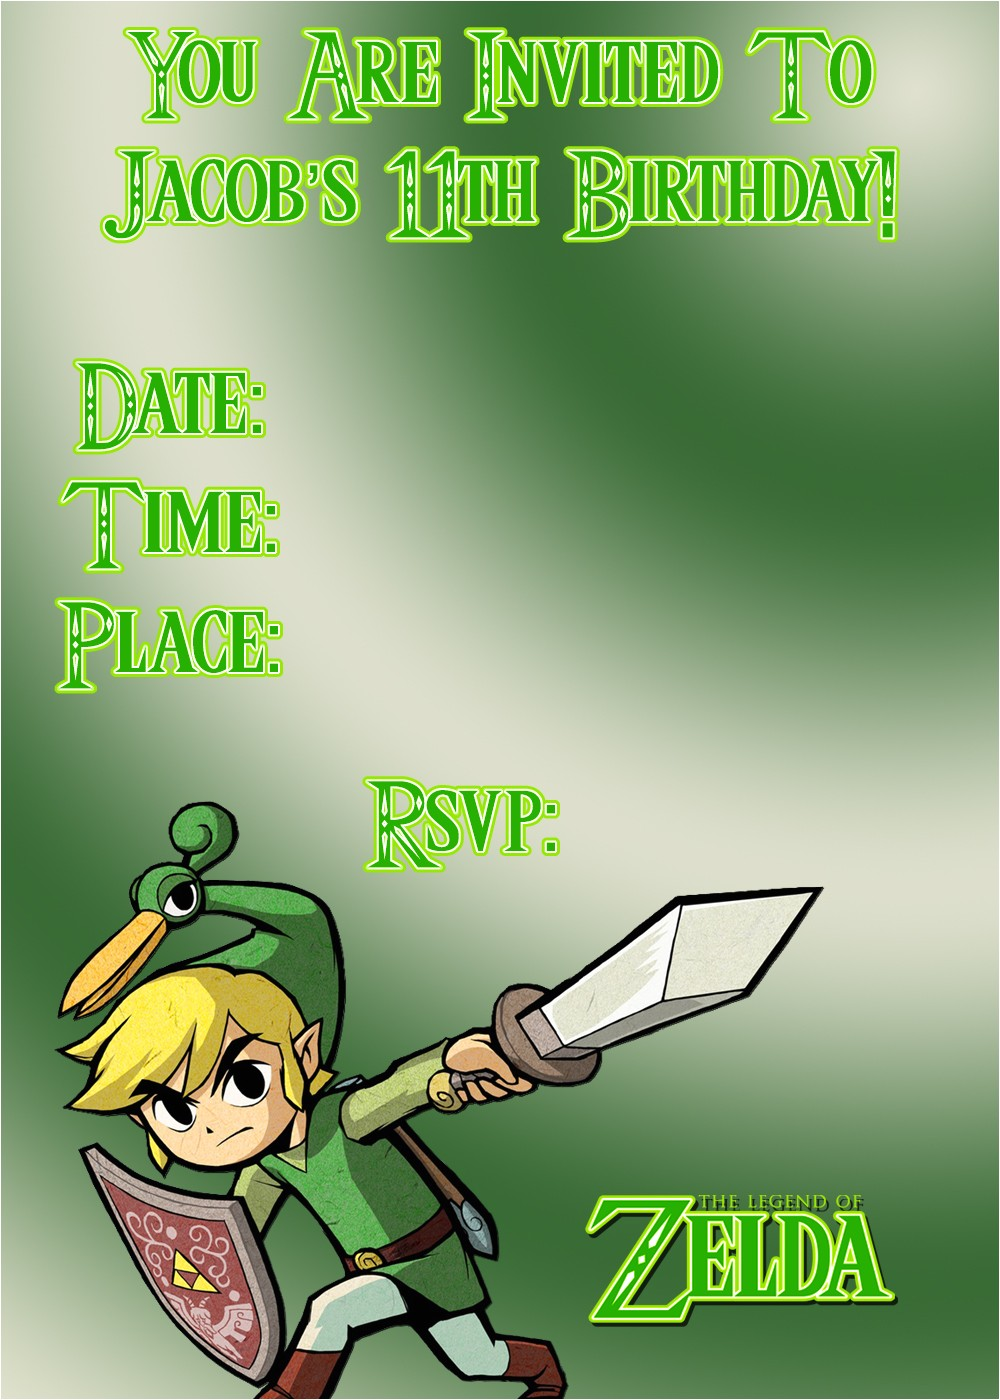 invitations4